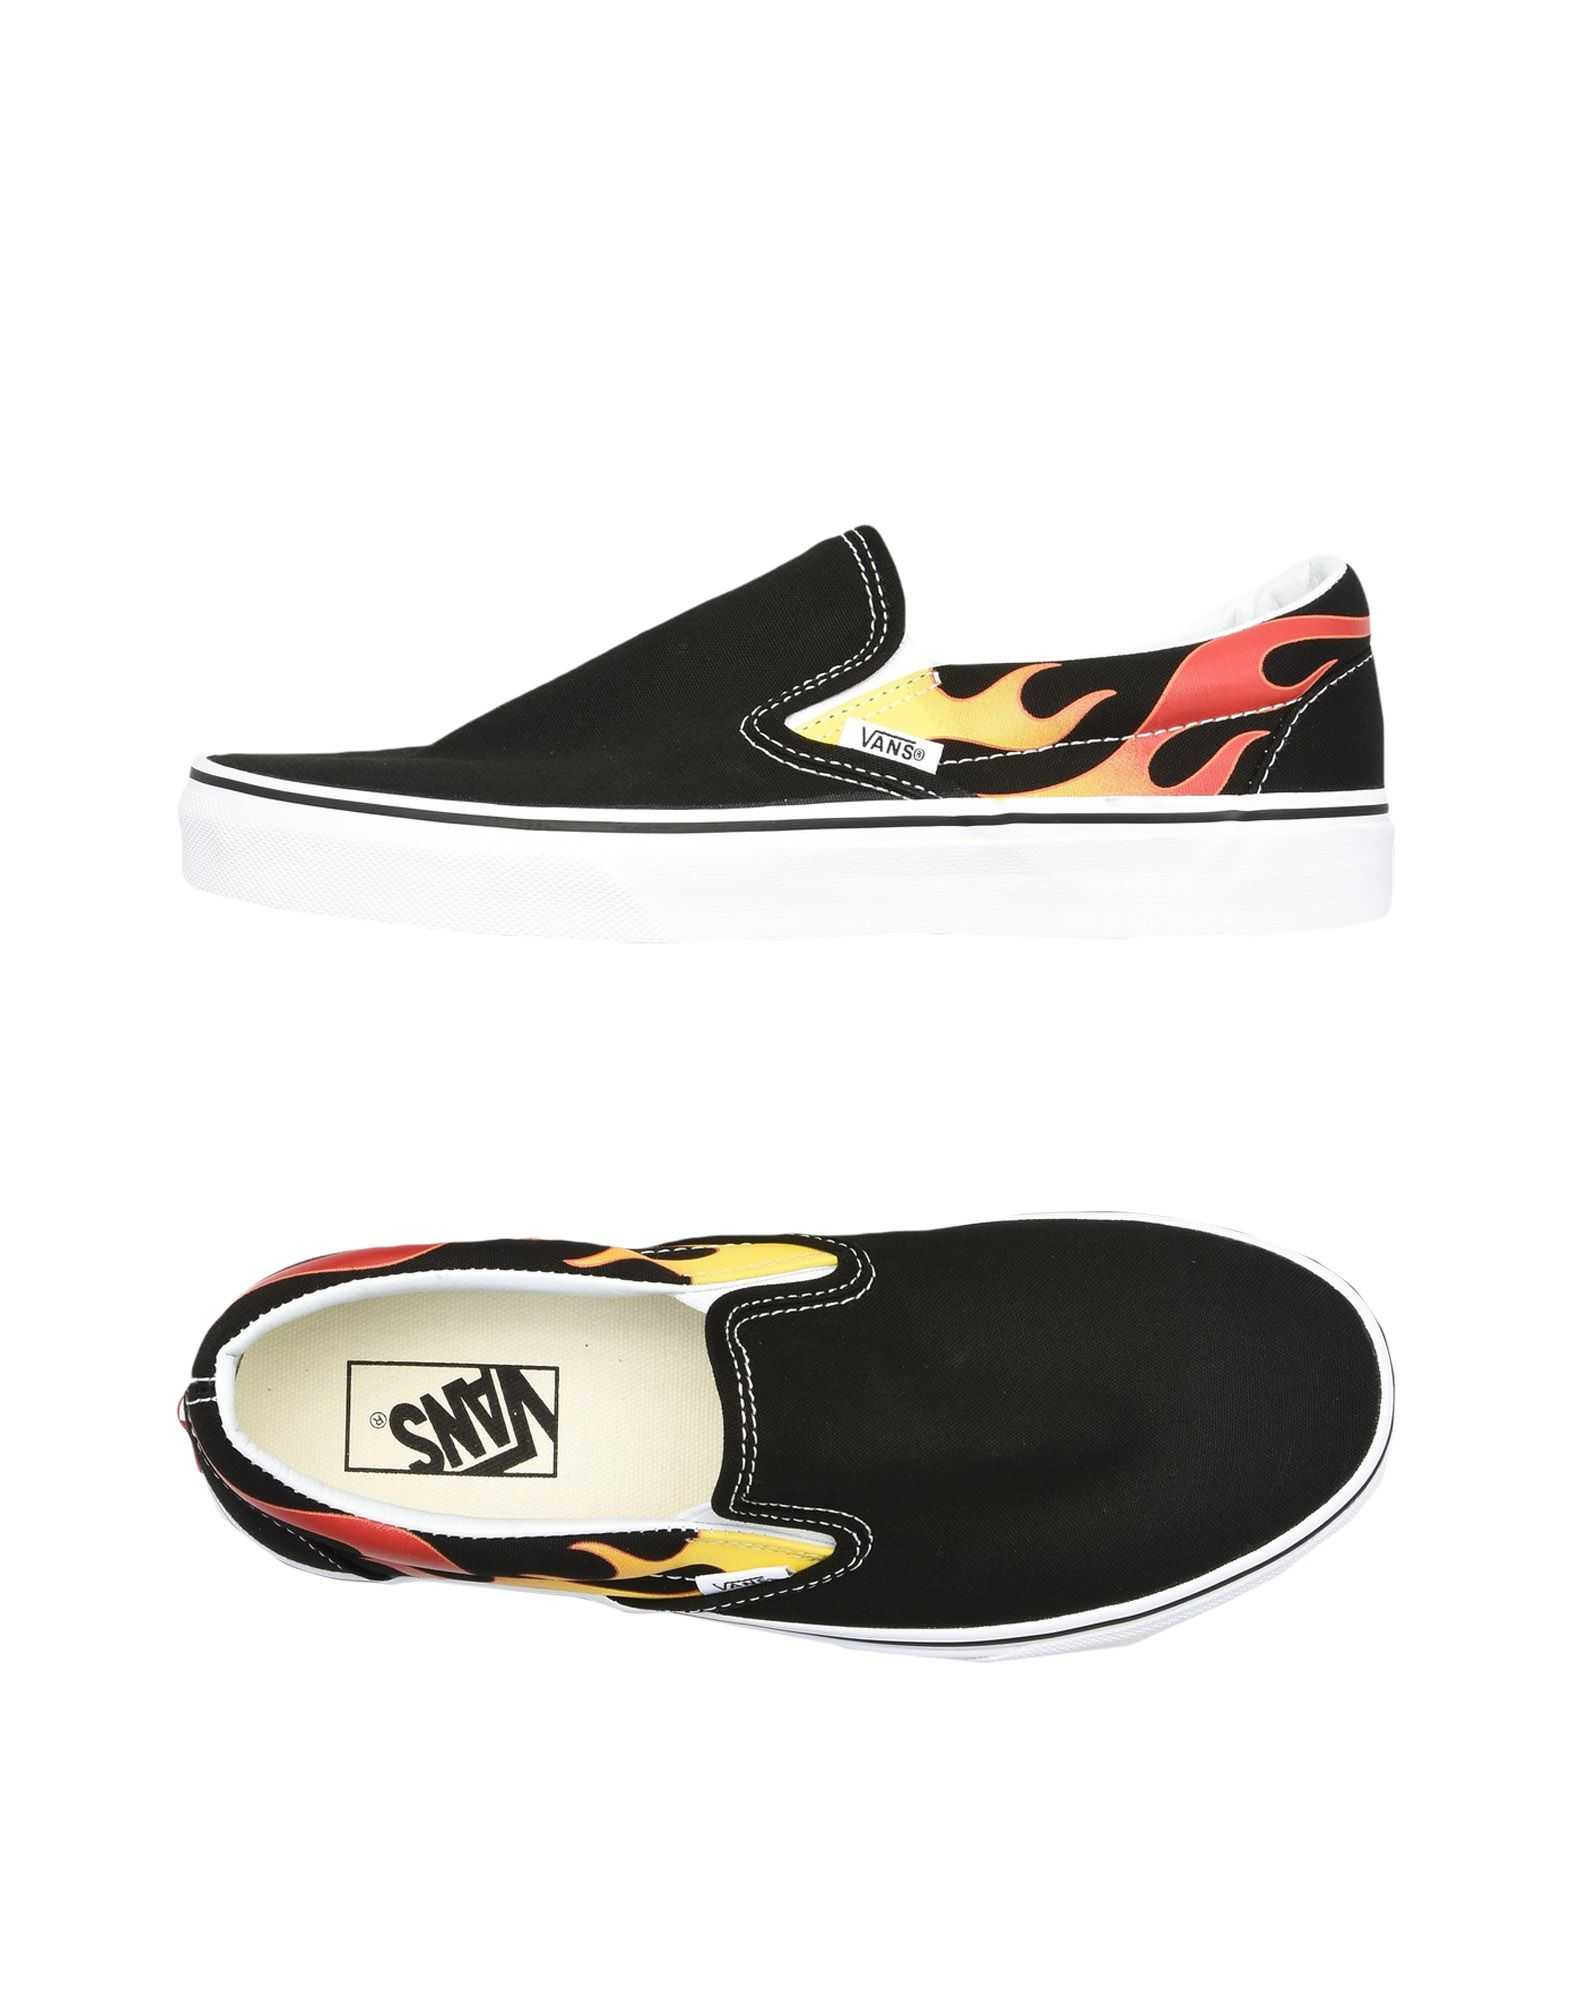 Sneakers Vans Slip On Flames Pack - Donna - 11496591DO